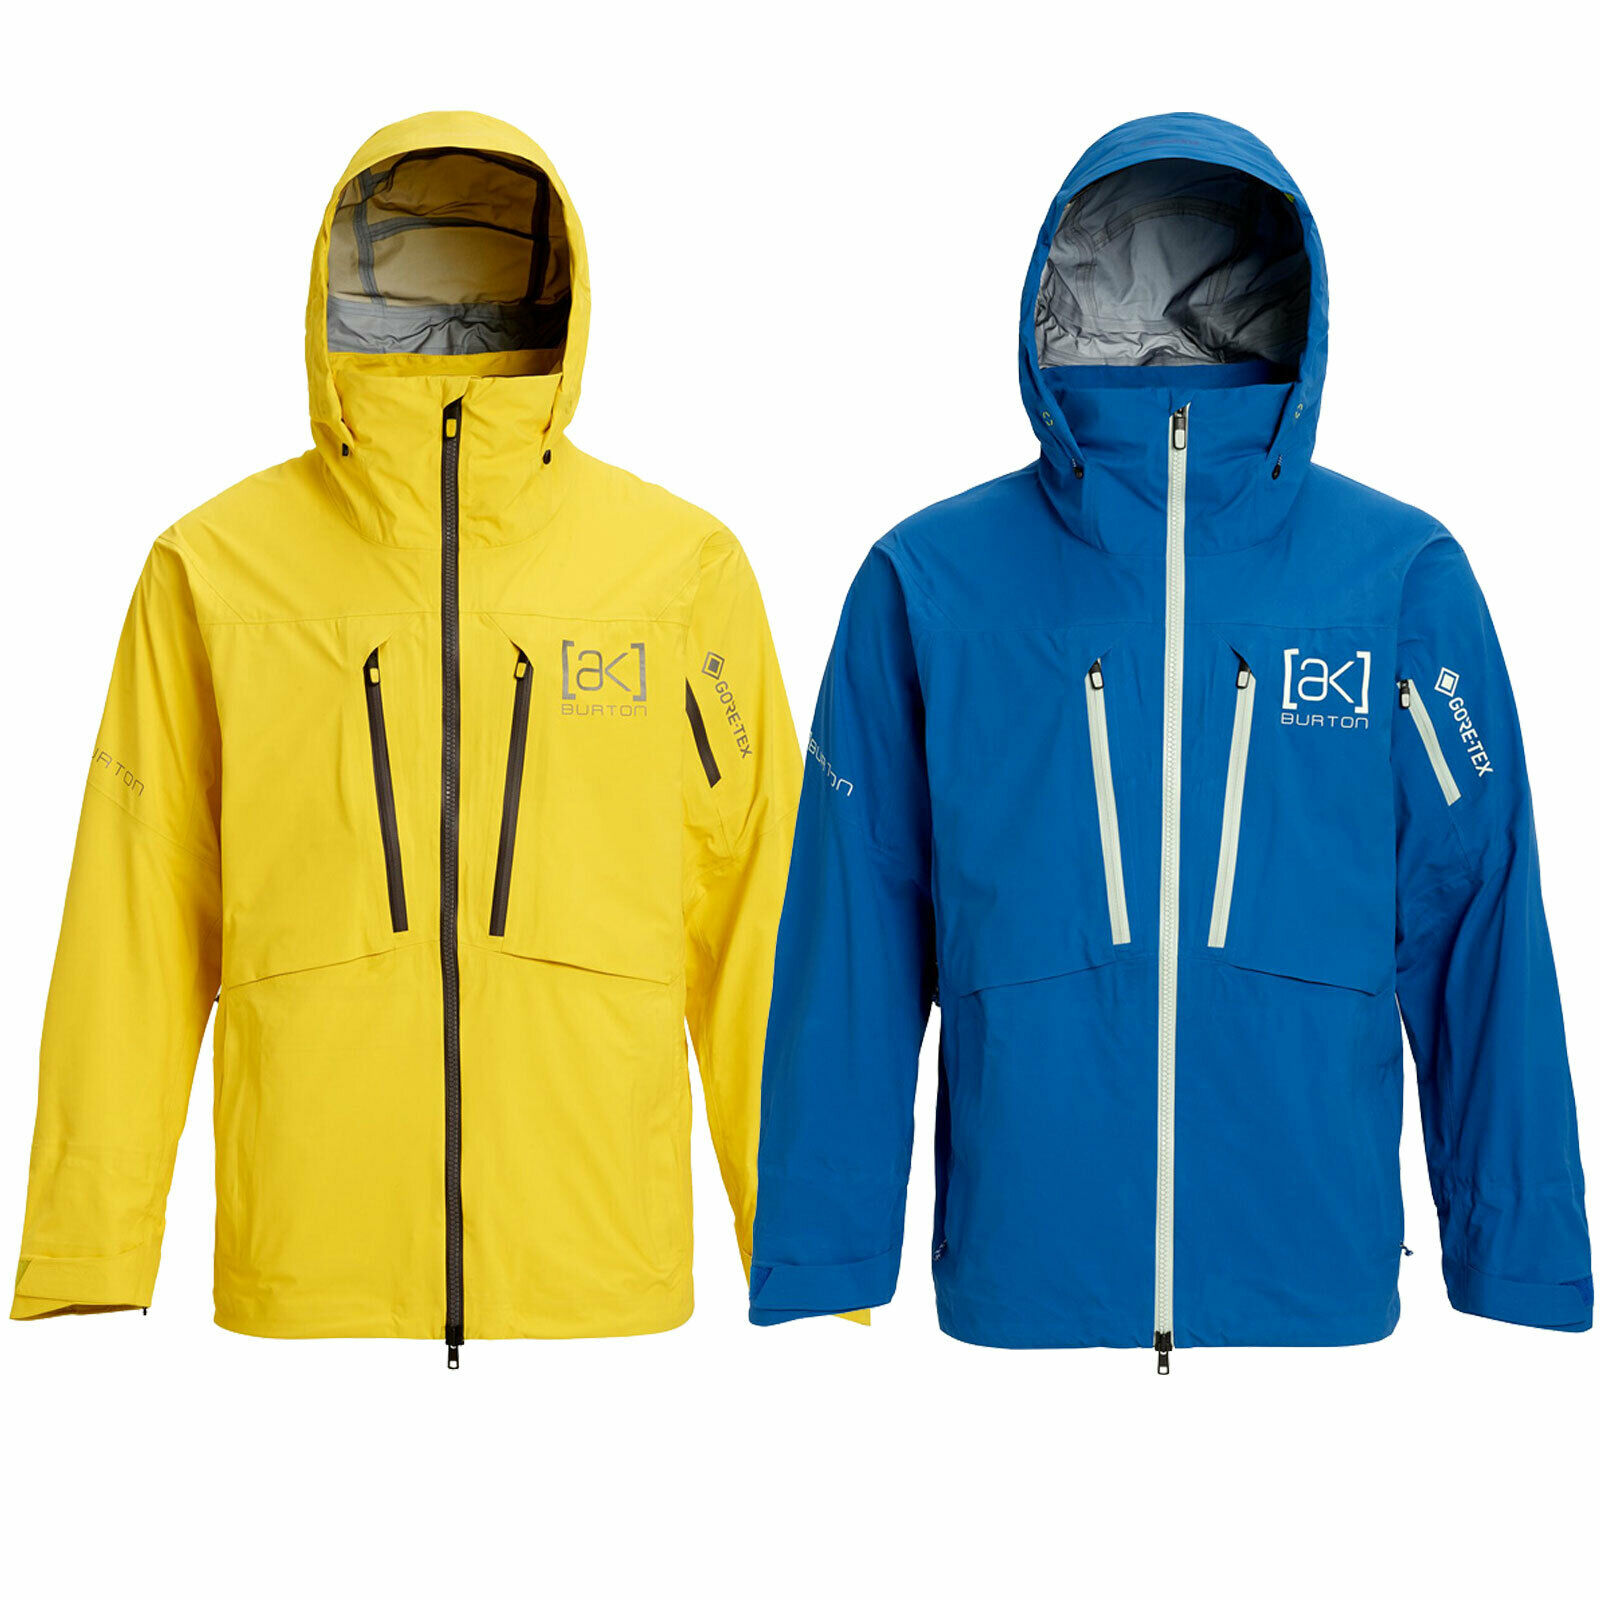 AK Burton HOVER Stretch Stretch Stretch Jacket UomoSnowtavola Giacca Giacca Sci Inverno Giacca Recco b4d